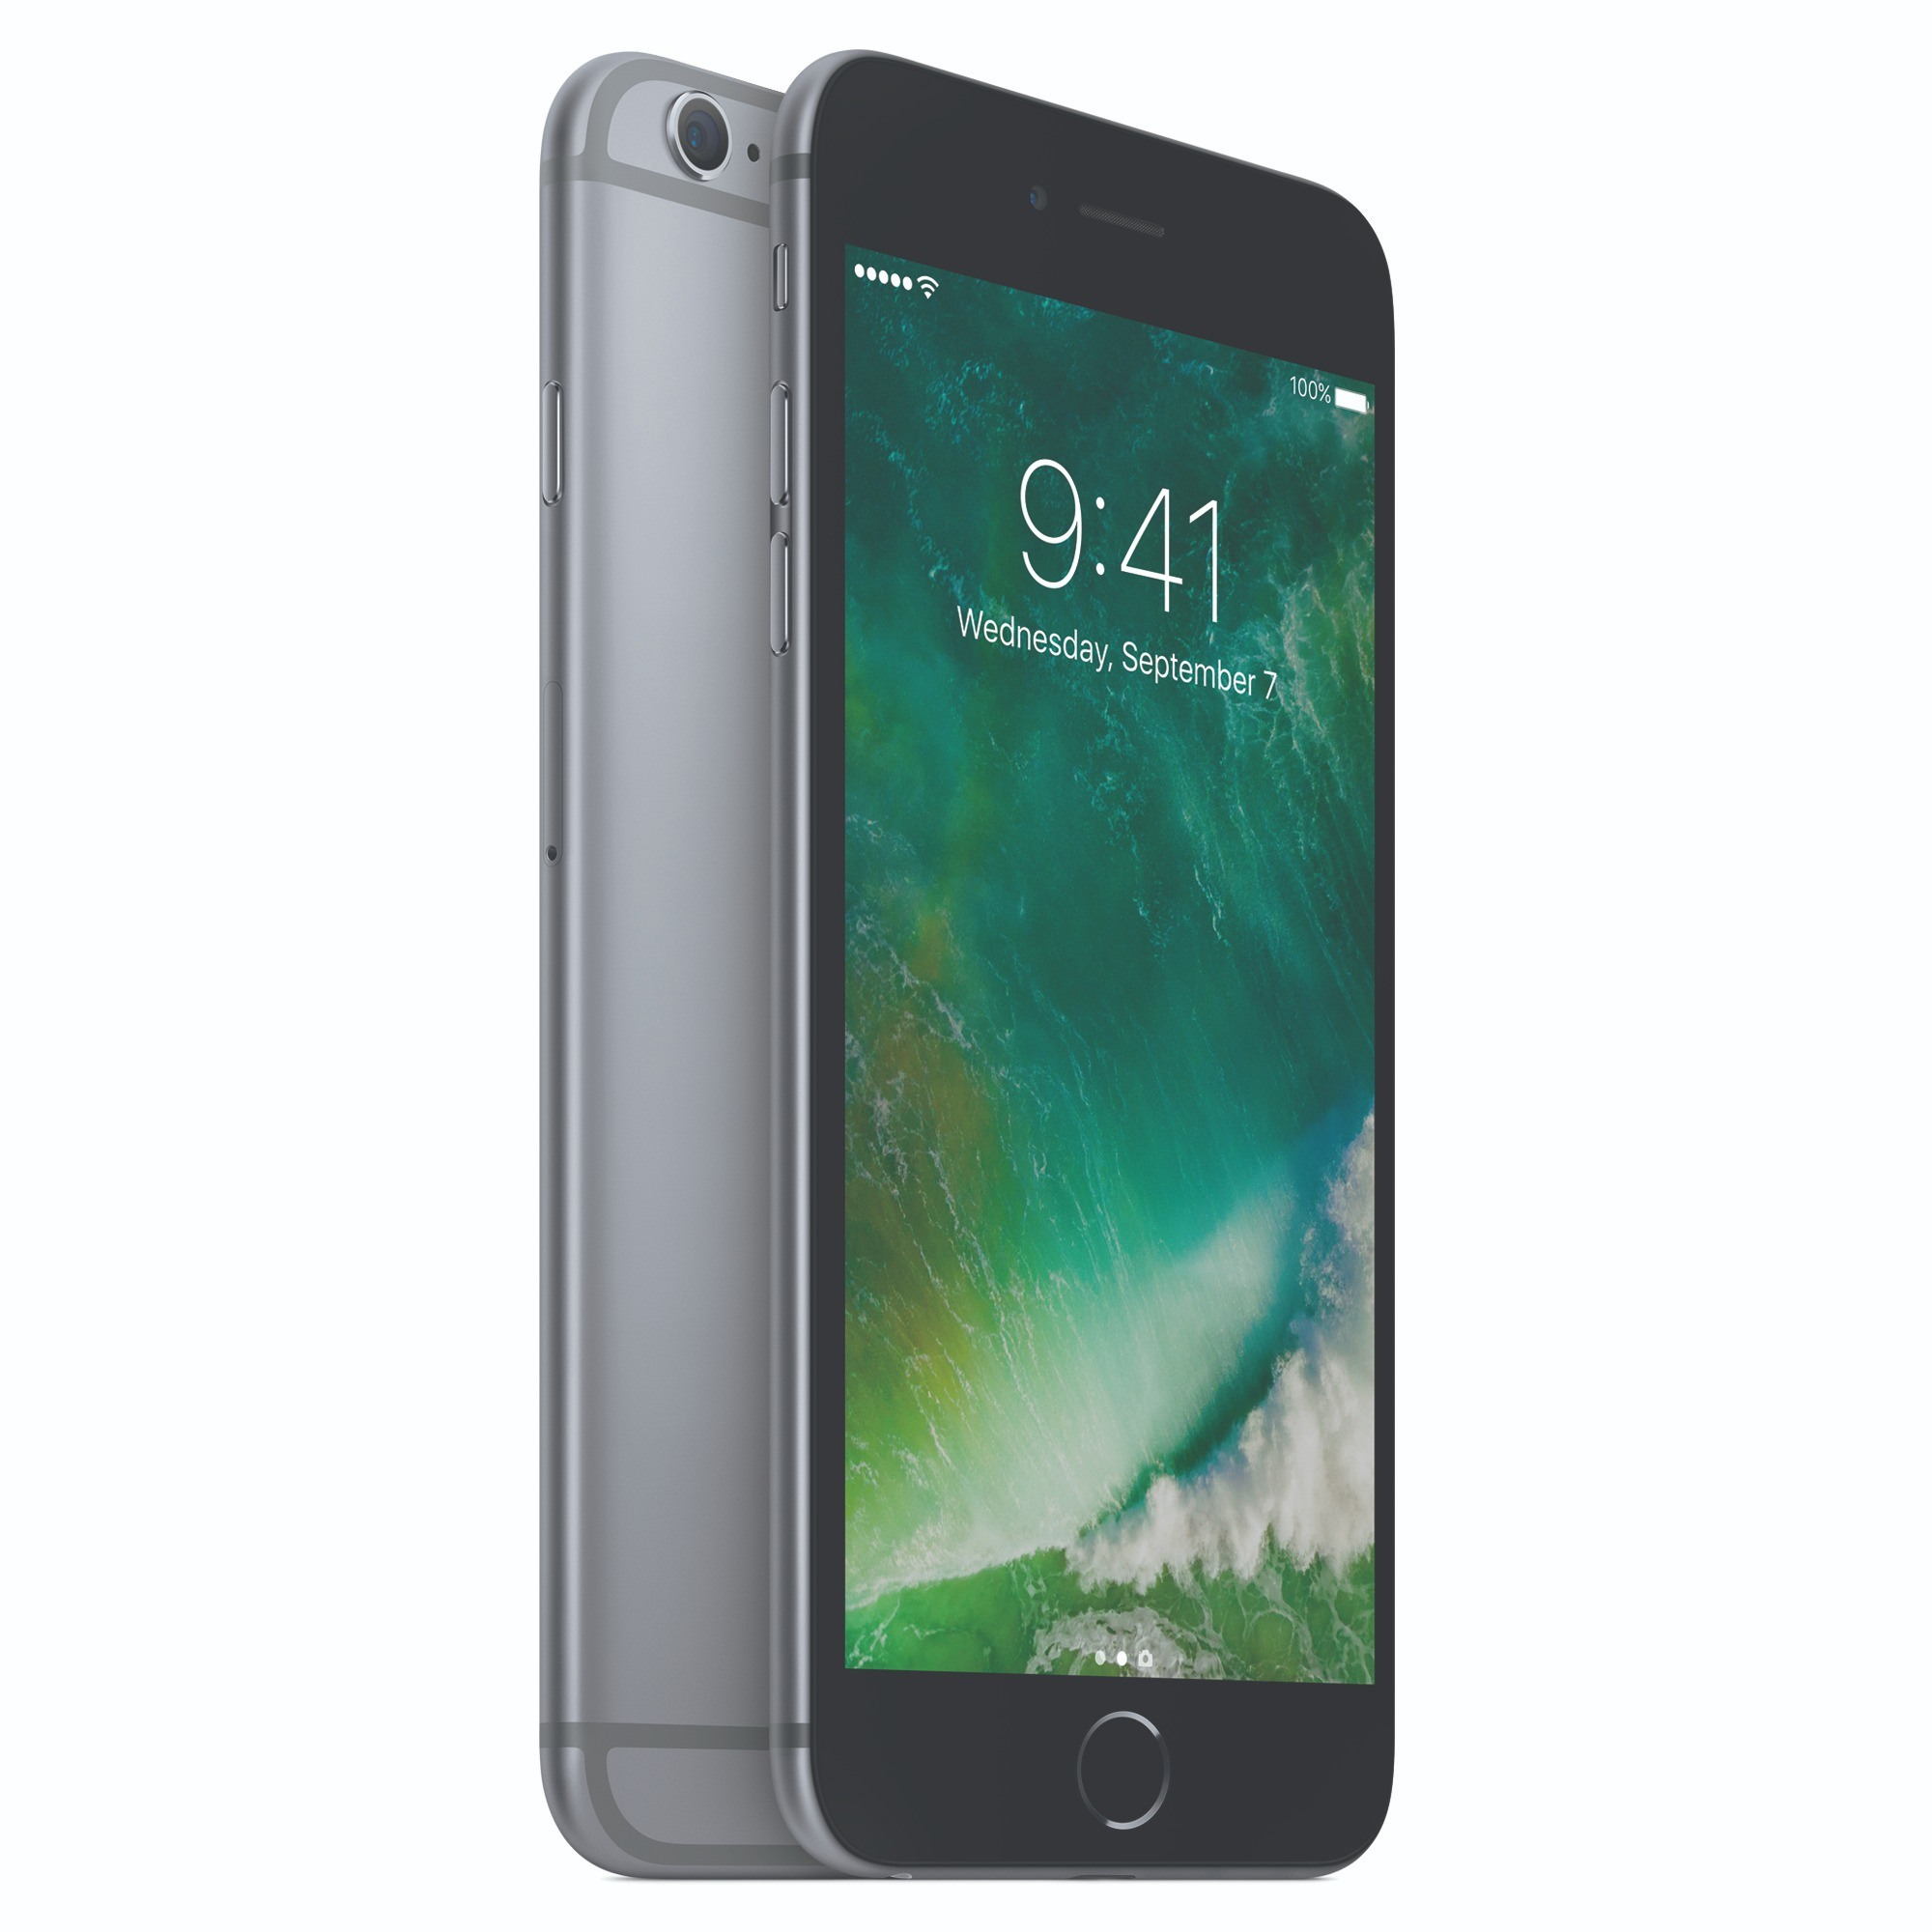 Total Wireless Apple iPhone 6s Plus 32GB Prepaid Smartphone, Space Gray Item